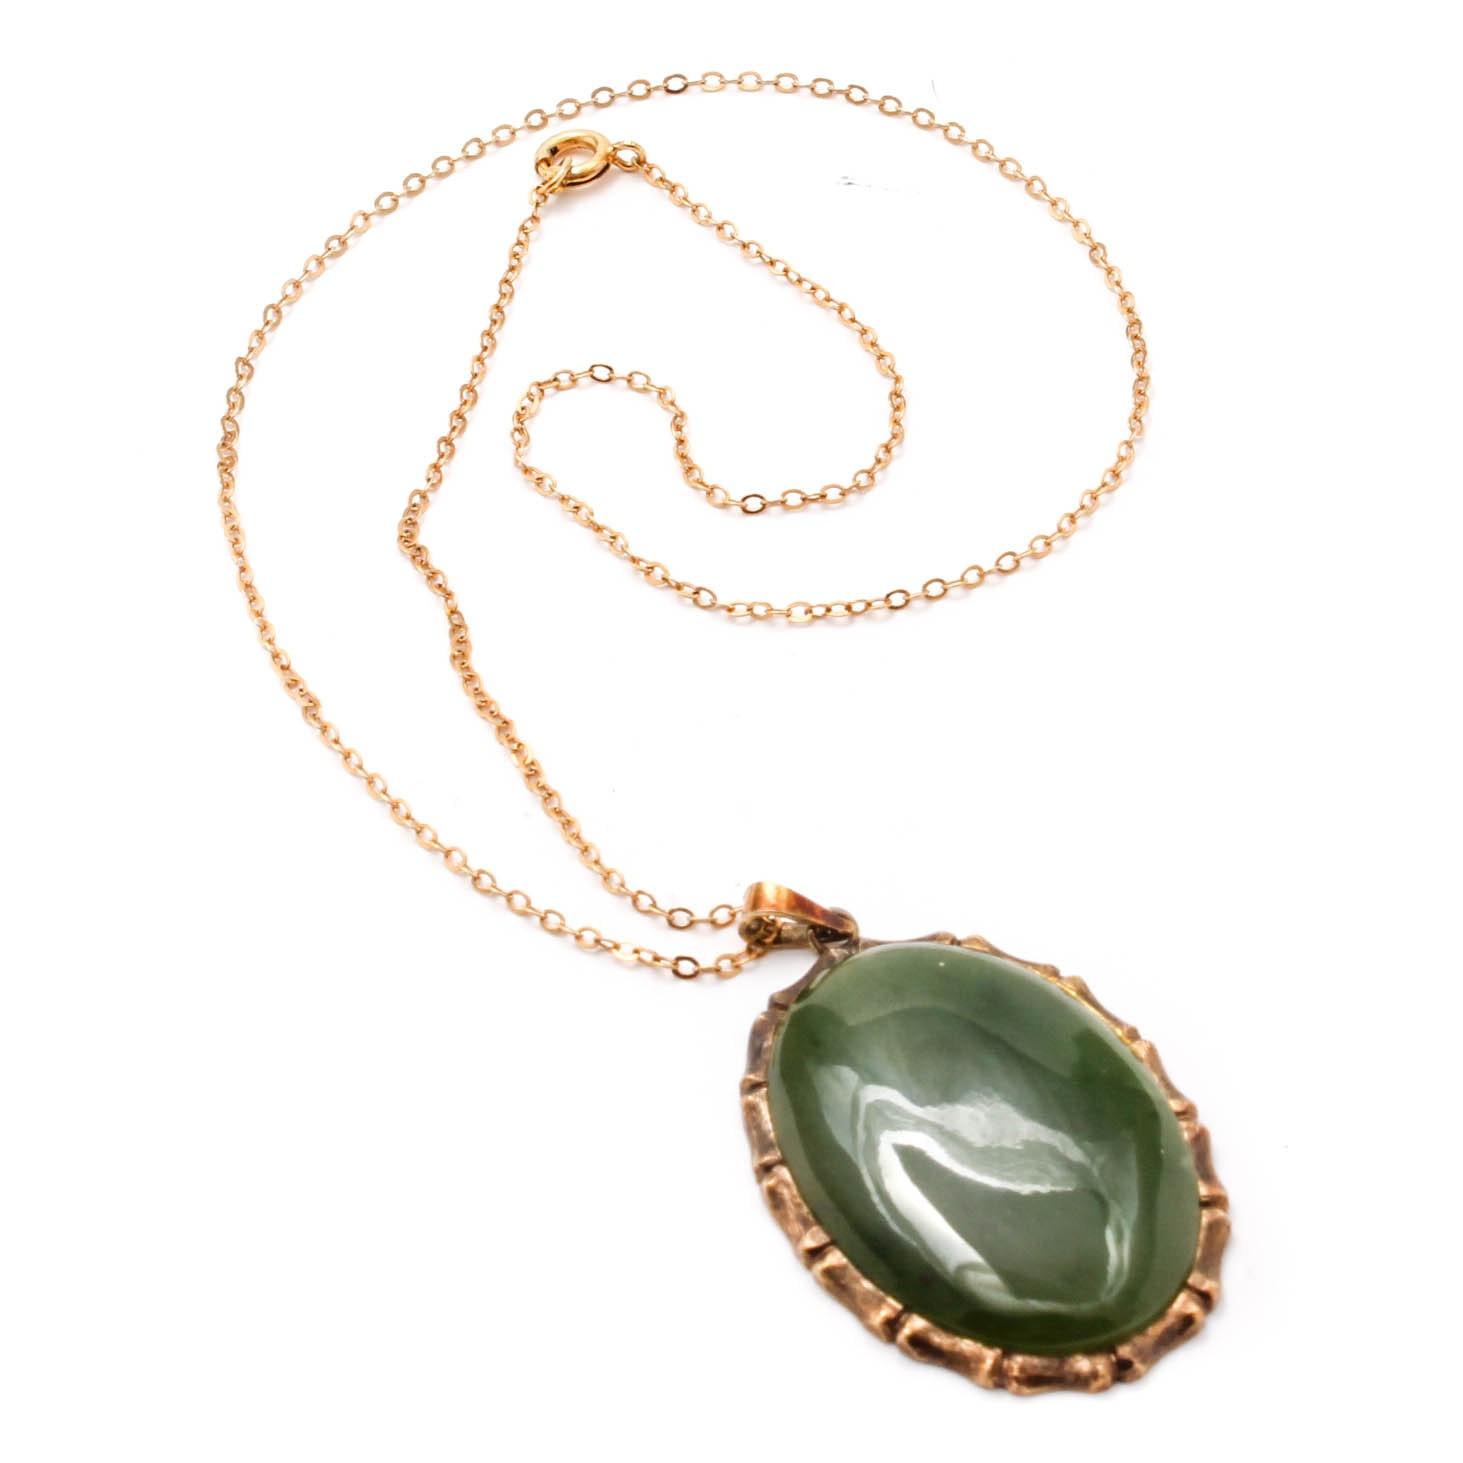 Costume Jewelry Necklace with Imitation Gemstone